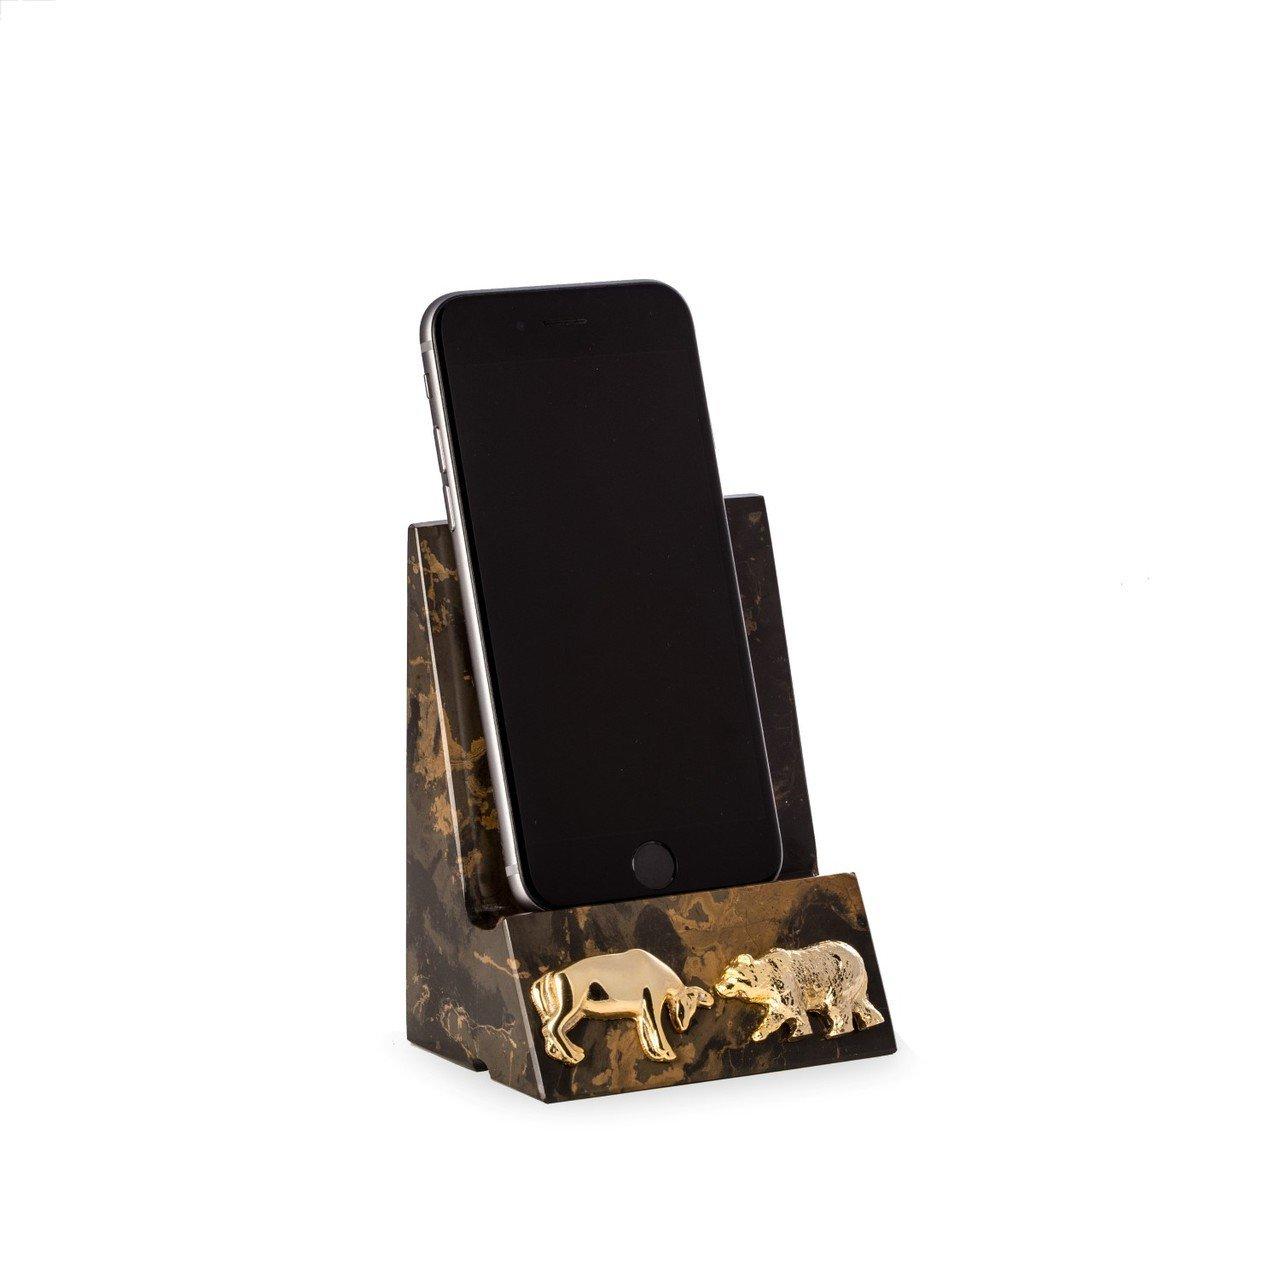 Bull and Bear Stock Market Tigers Eye Marble Desktop Cell Phone /& Tablet Cradle Holder Bey Berk DO27B